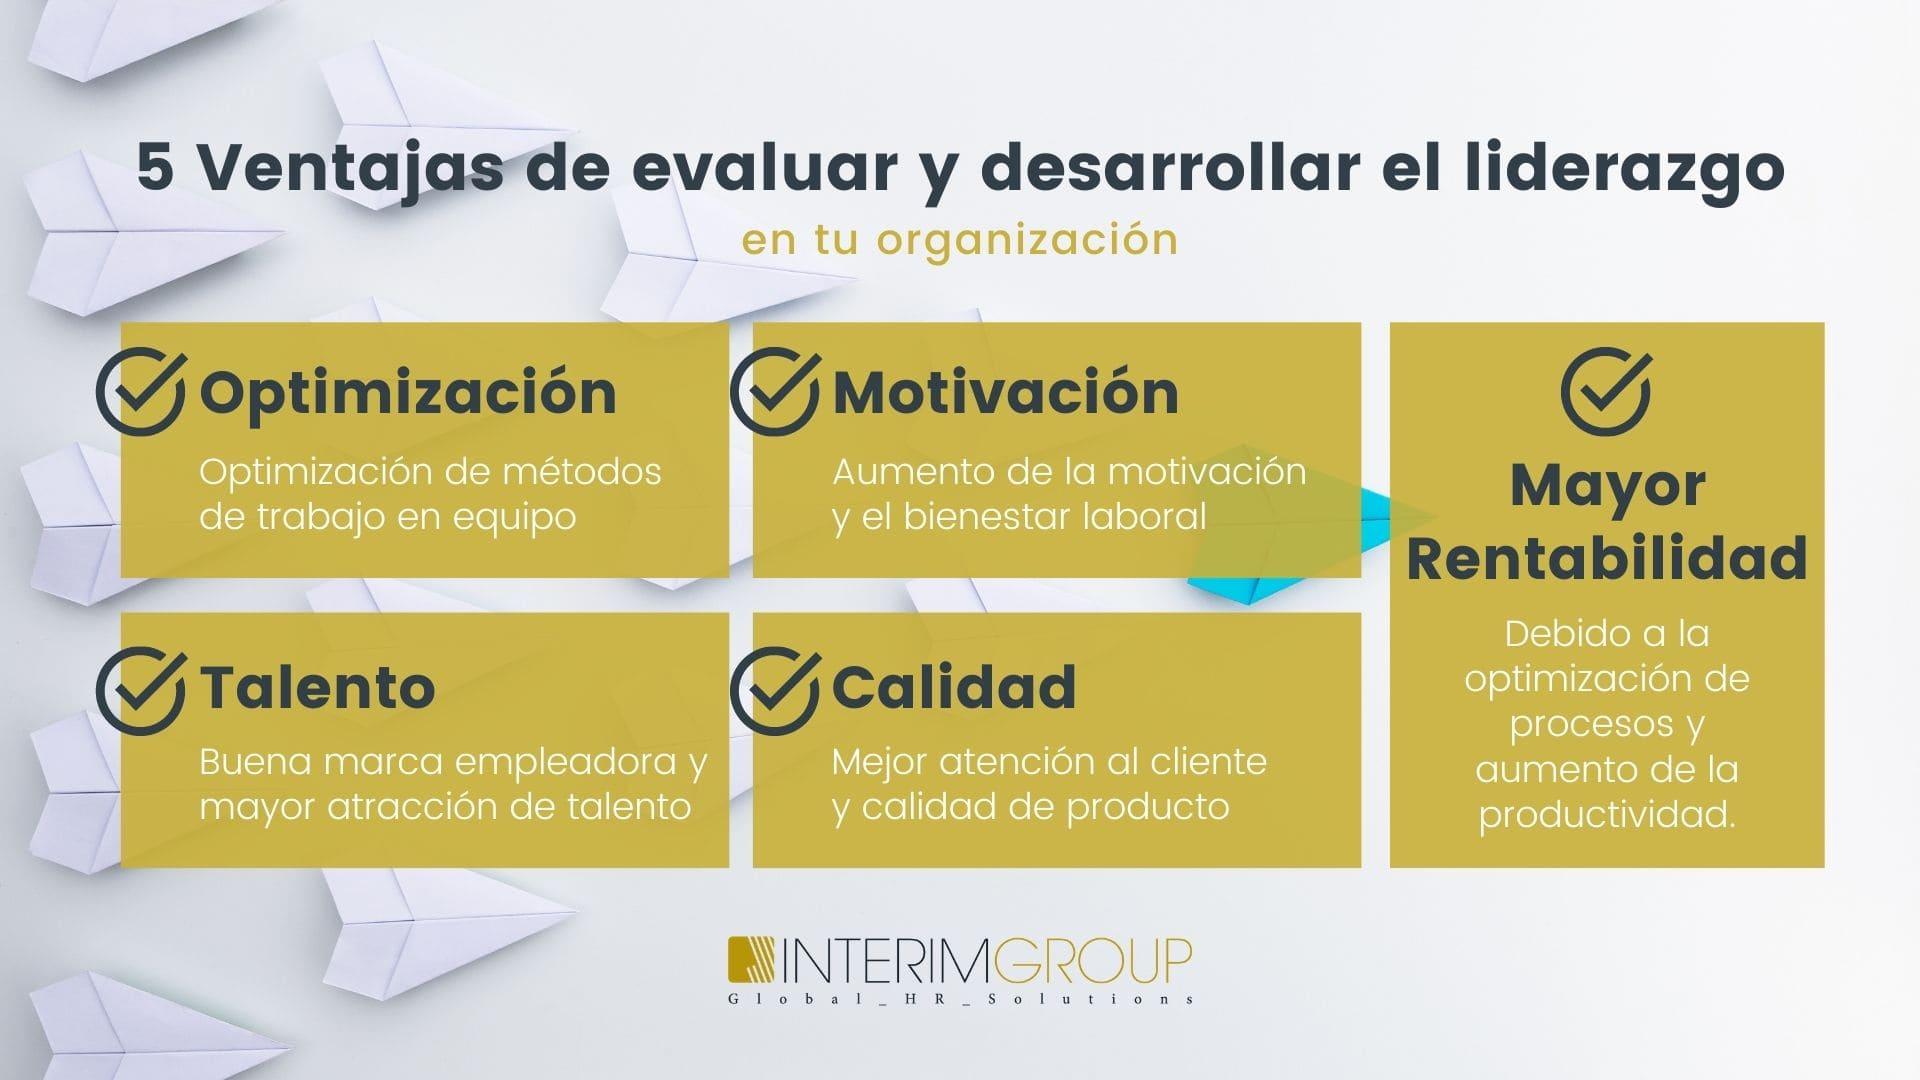 liderazgo-mandos-intermedios_ventajas_INTERIM-GROUP (1)